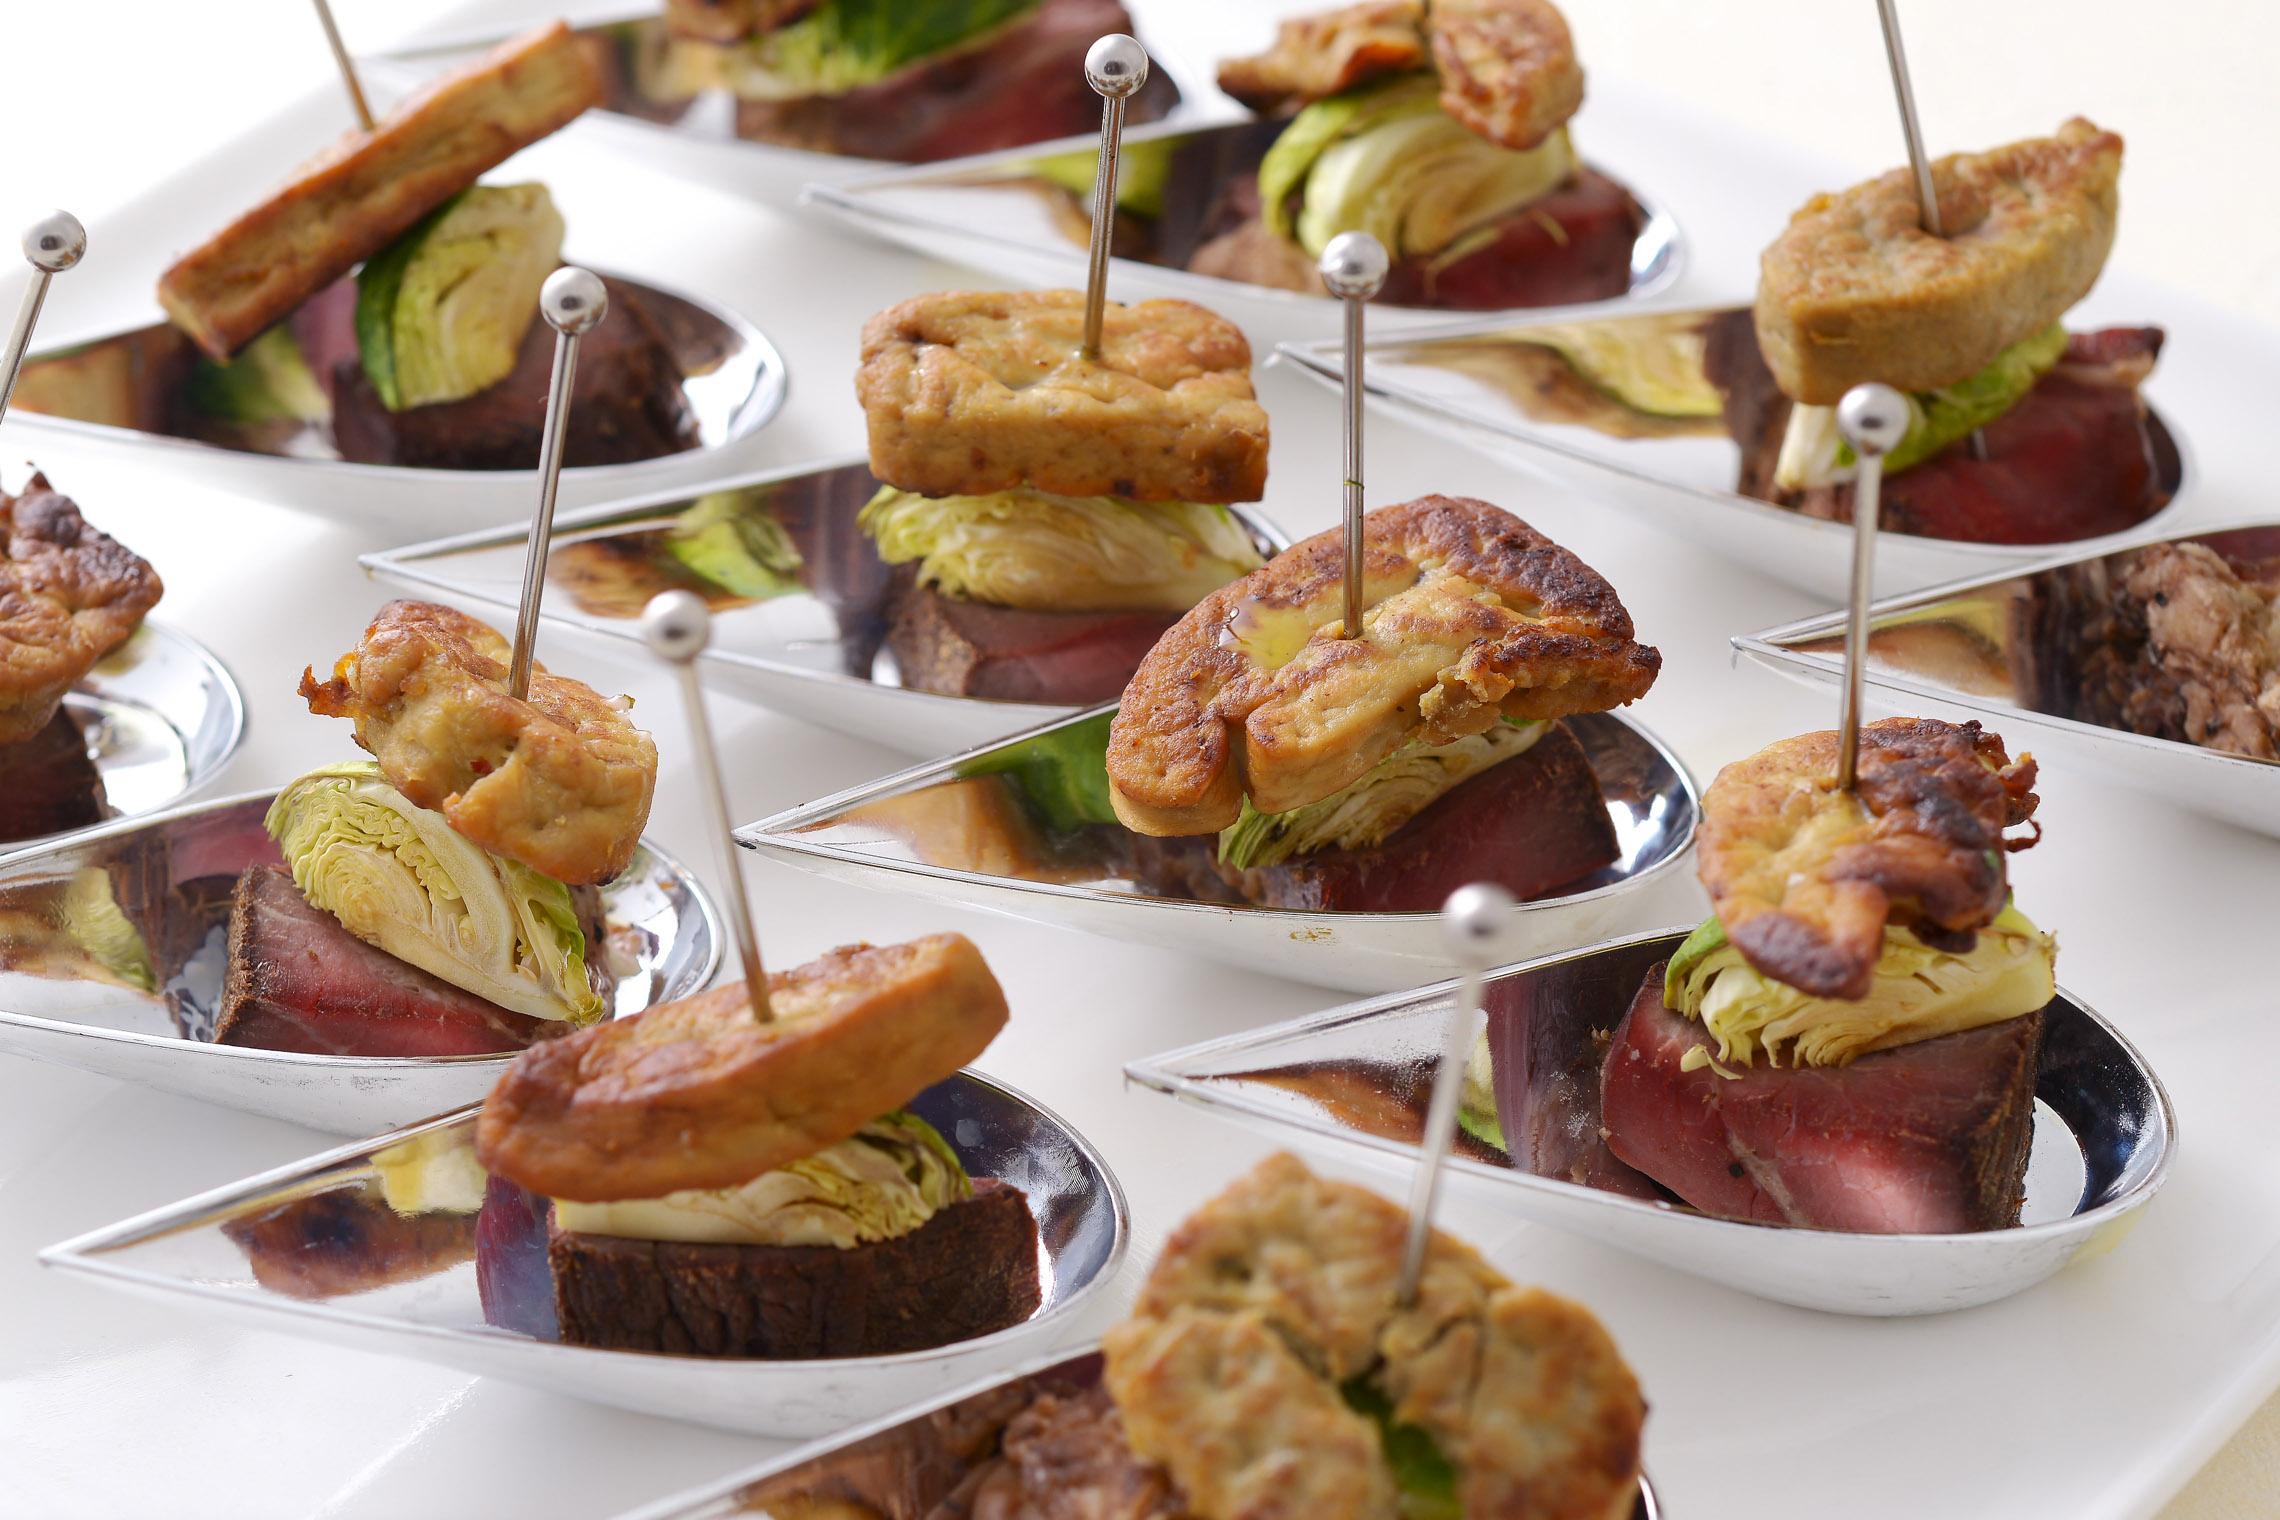 <p>フォアグラとローストビーフを贅沢にピンチョススタイルで。トリフ風味のバルサミコを使用する事で口の中でマリアージュがGOOD!!</p>